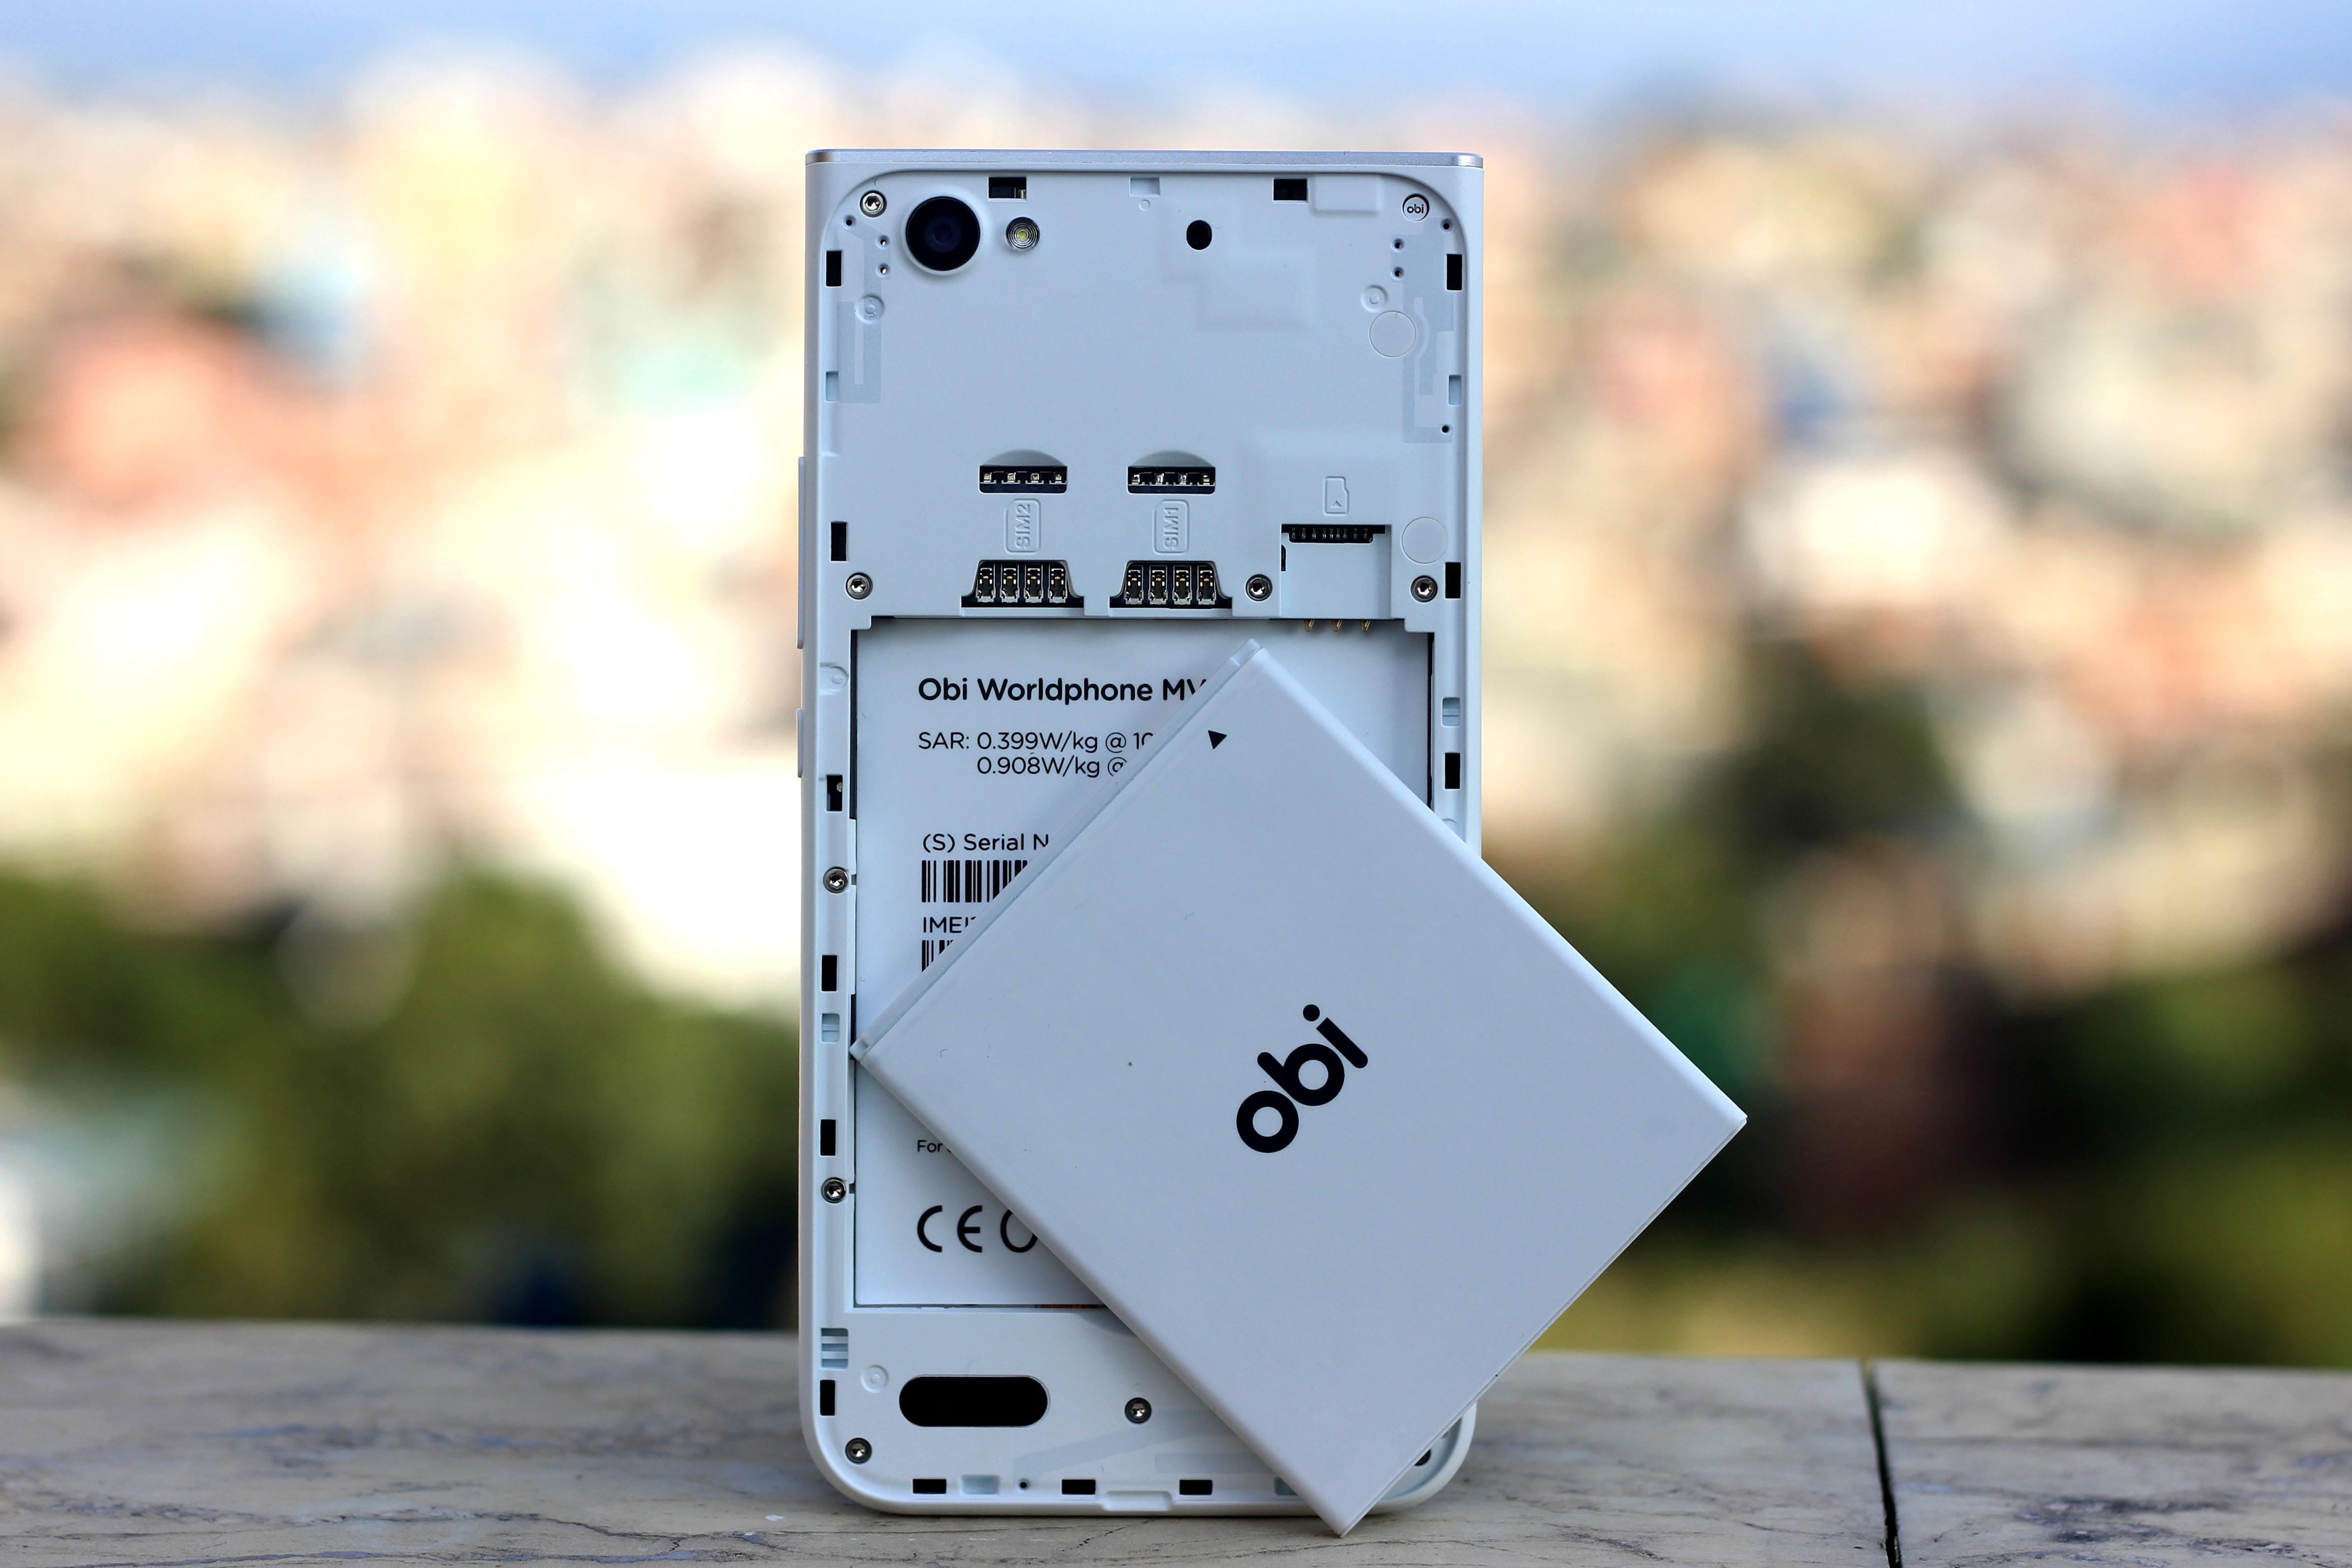 obi-worldphone-mv1-battery